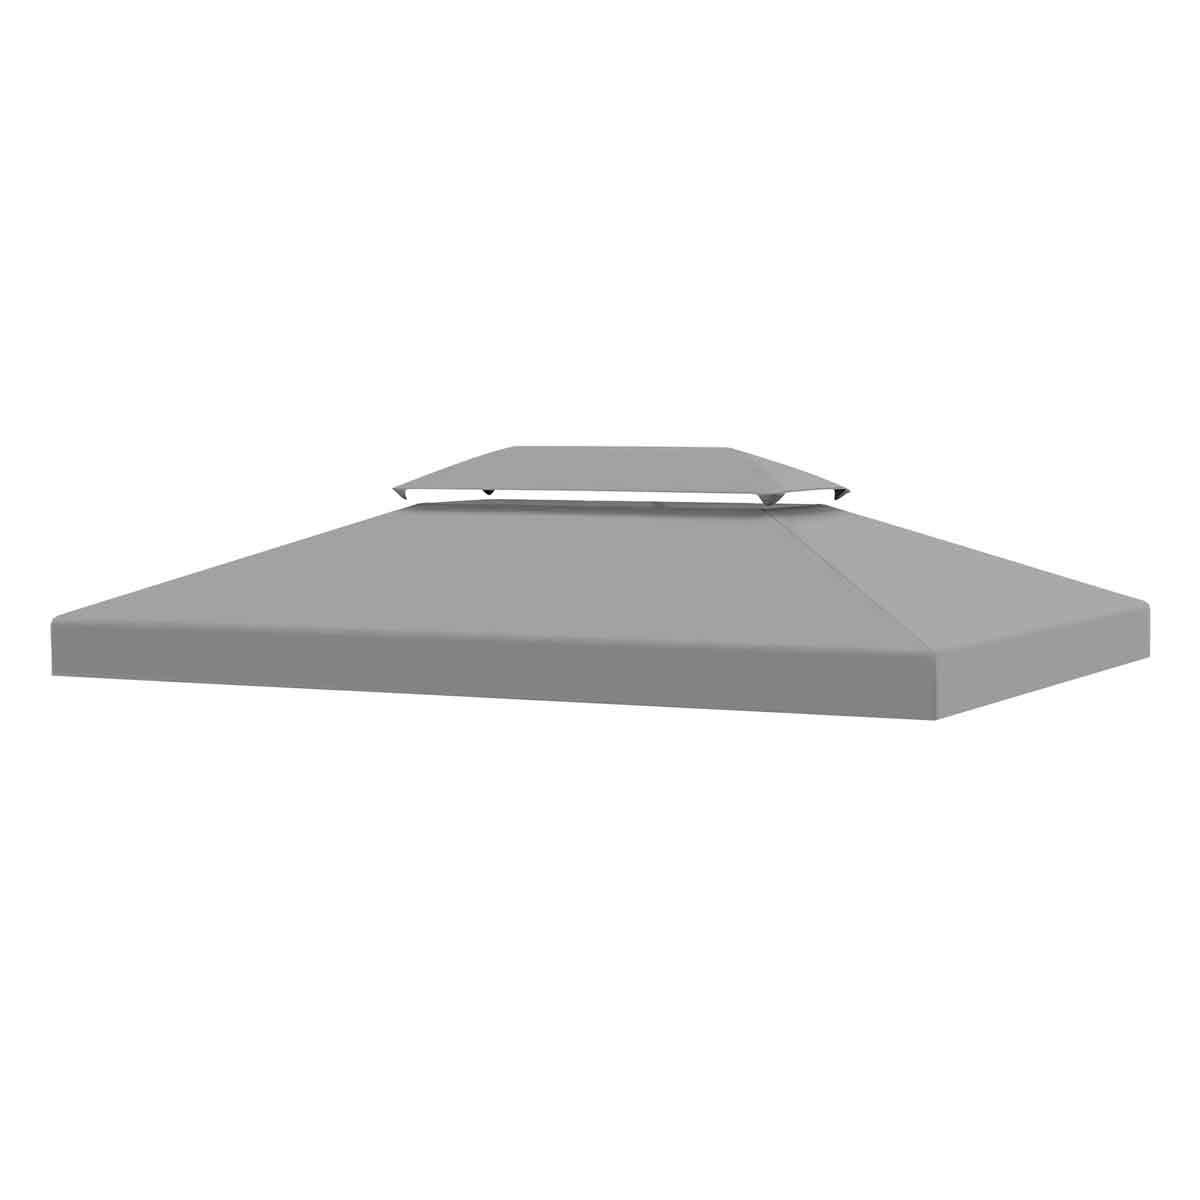 Outsunny 3x4m Replacement Gazebo Canopy - Light Grey